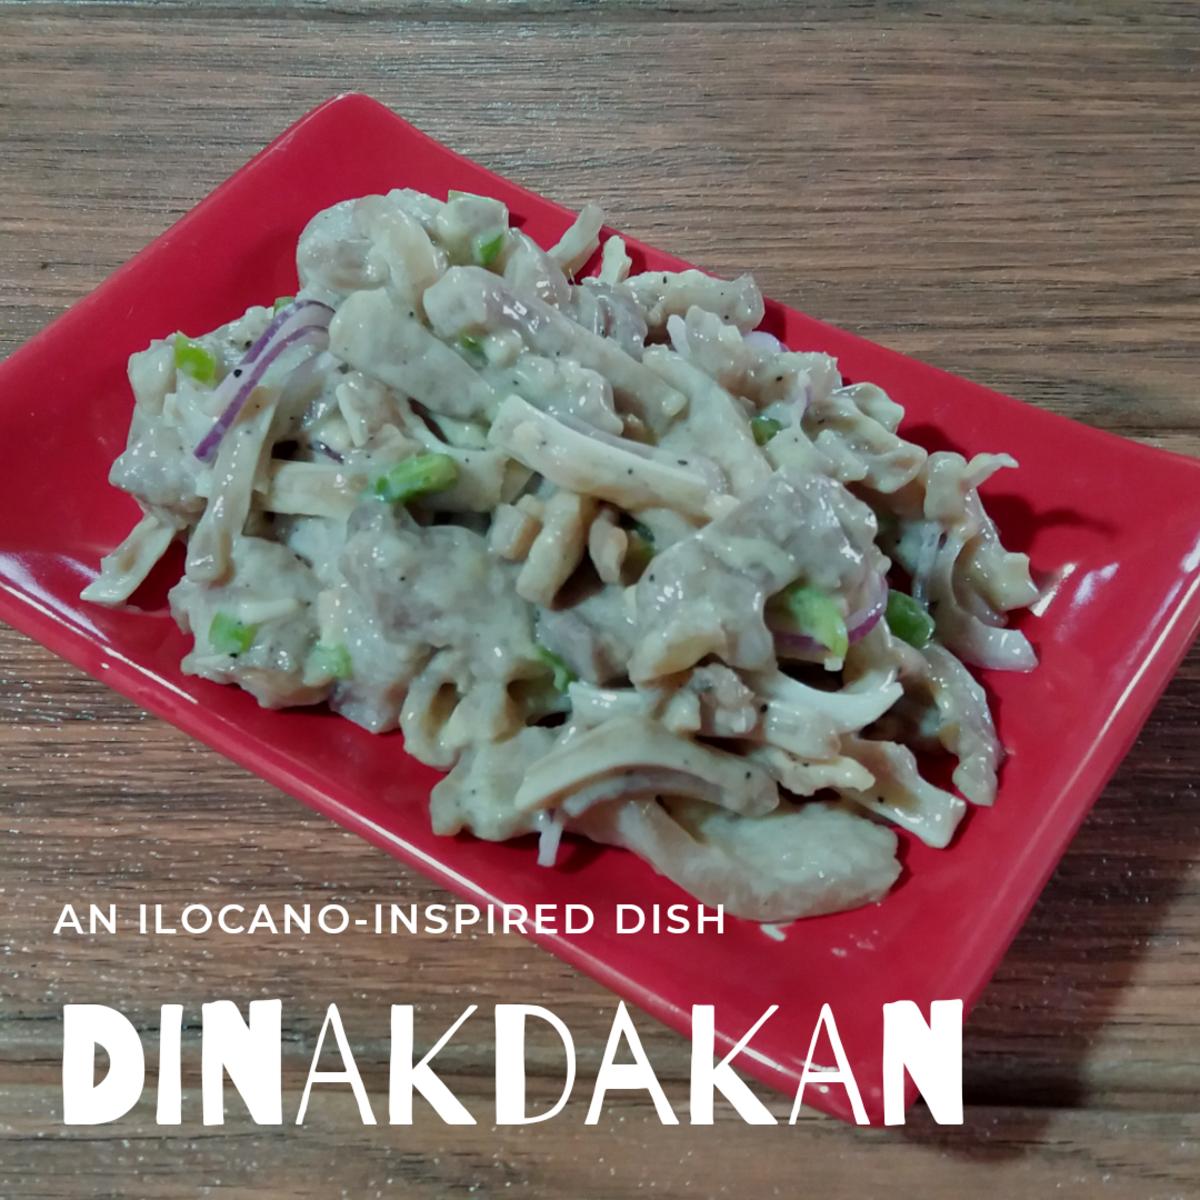 Dinakdakan is an Ilocano delicacy